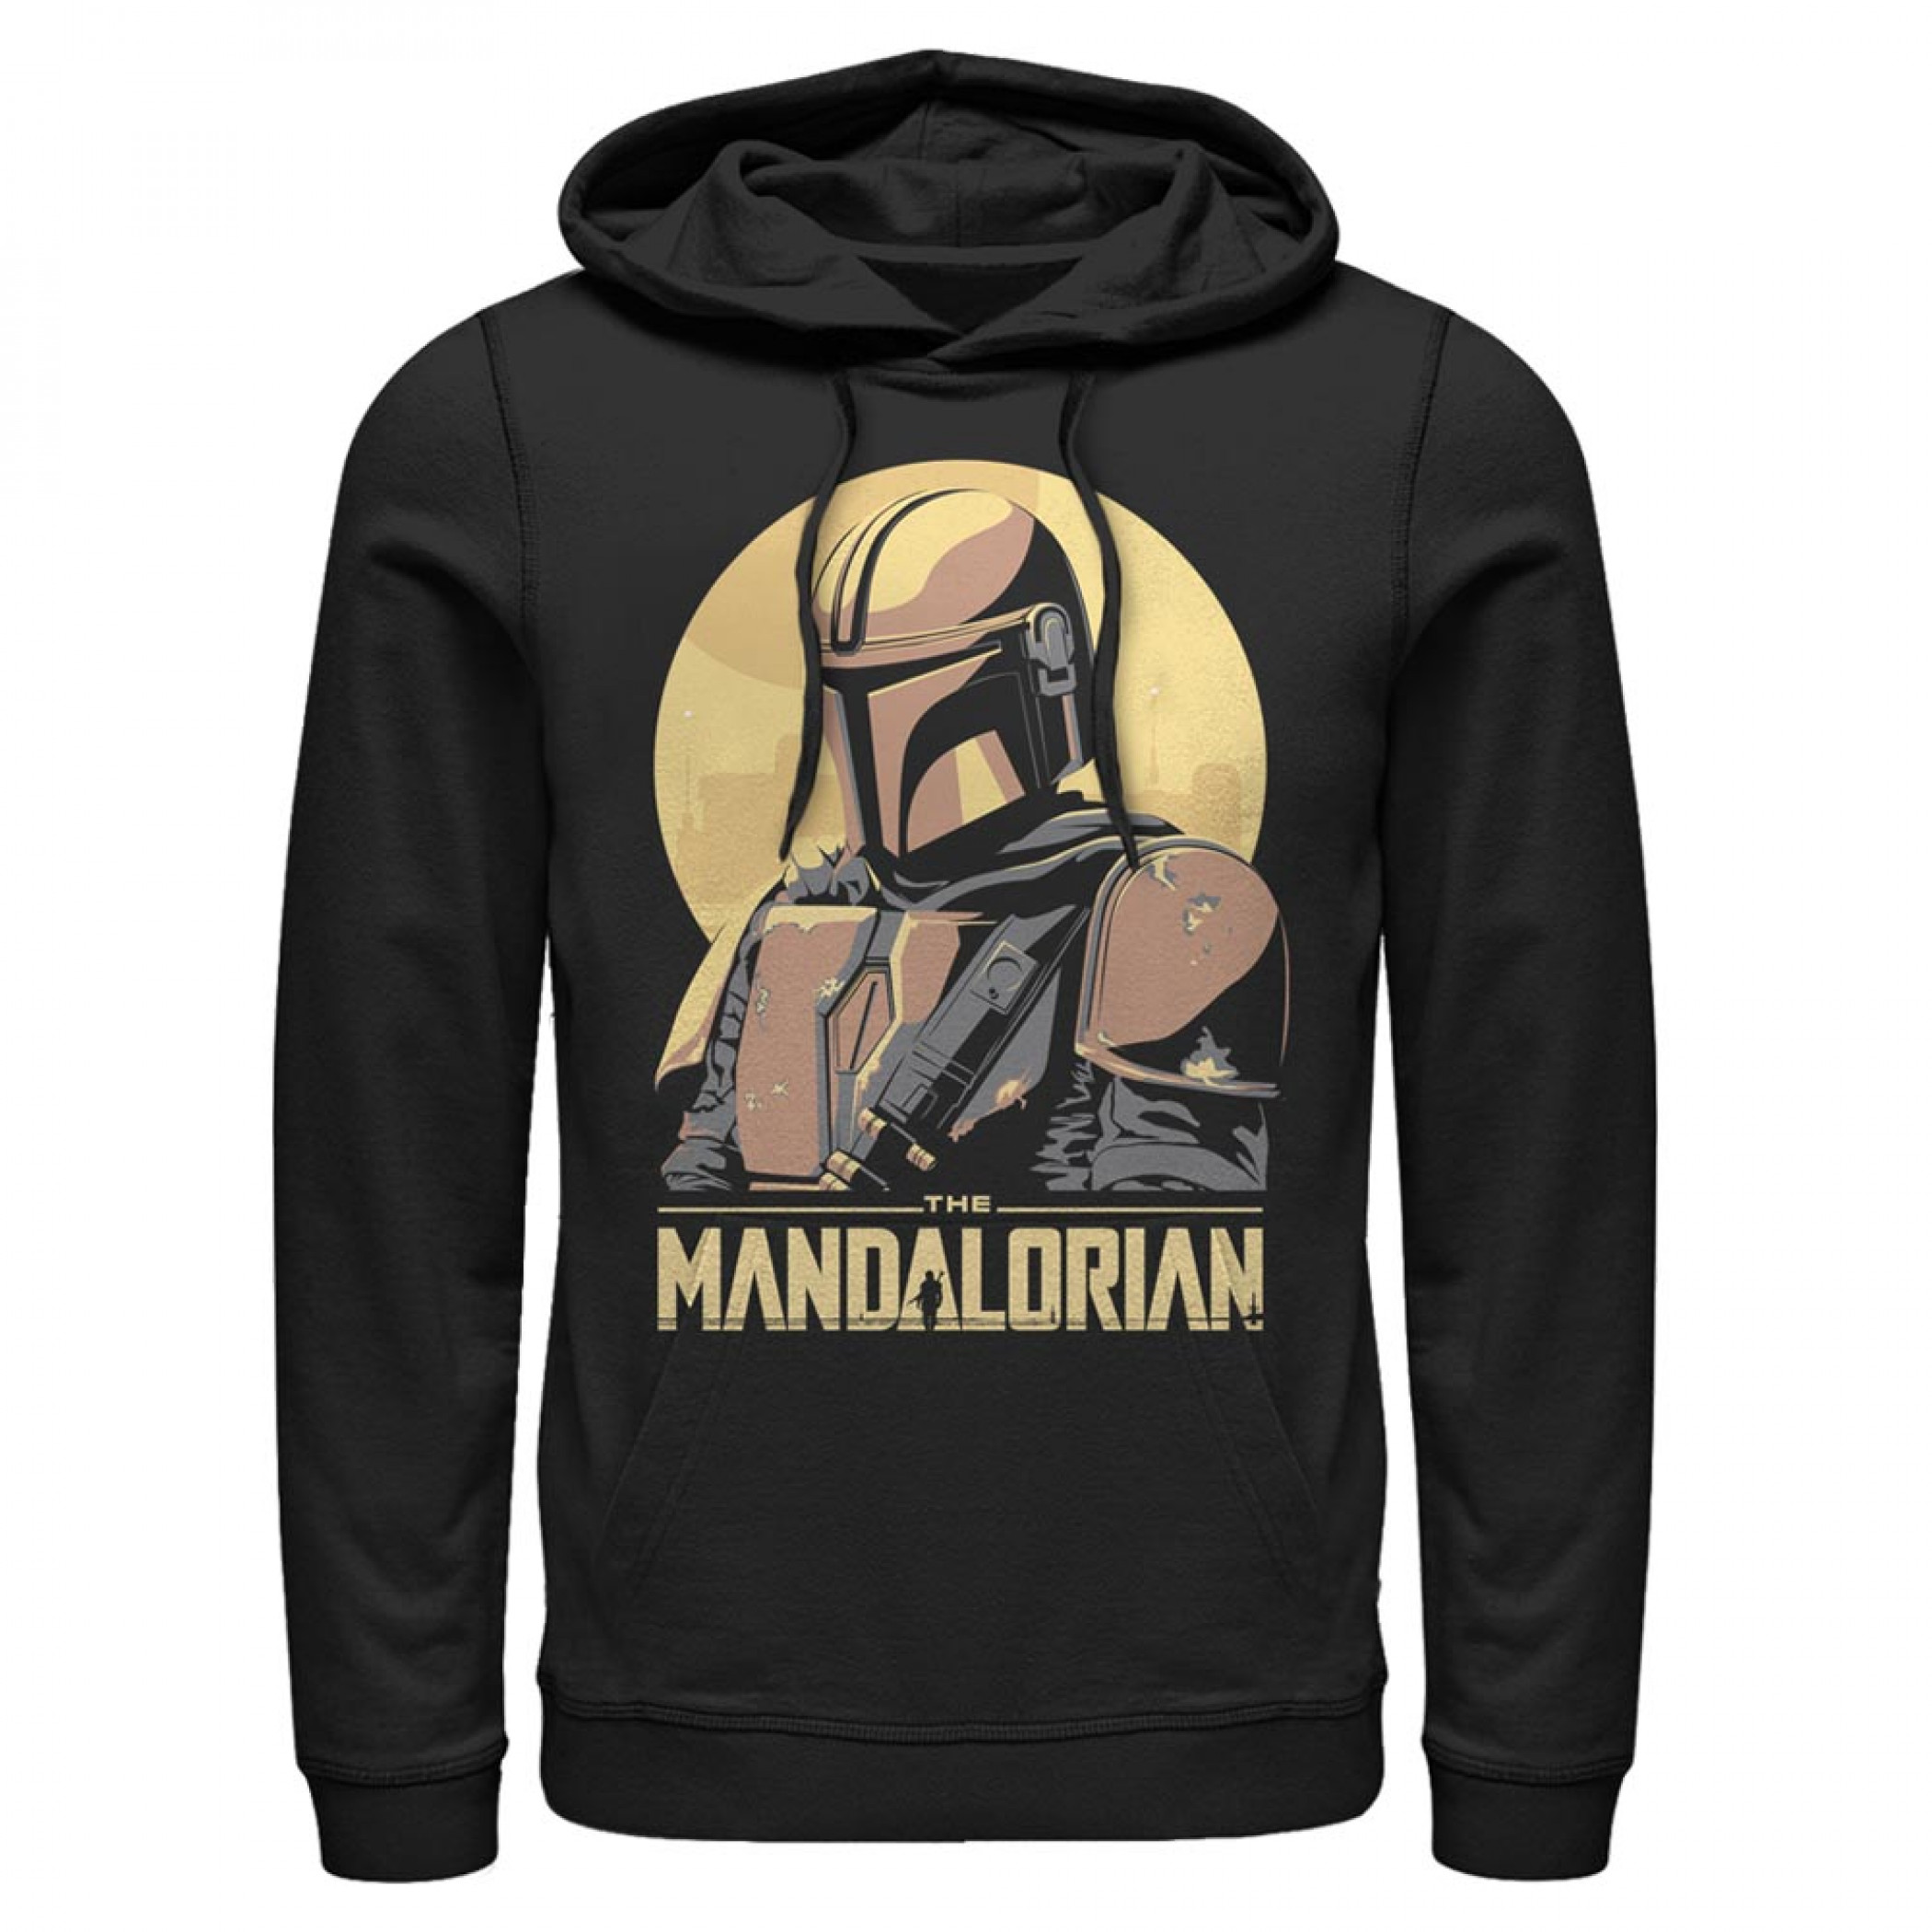 The Mandalorian Sunset Hoodie